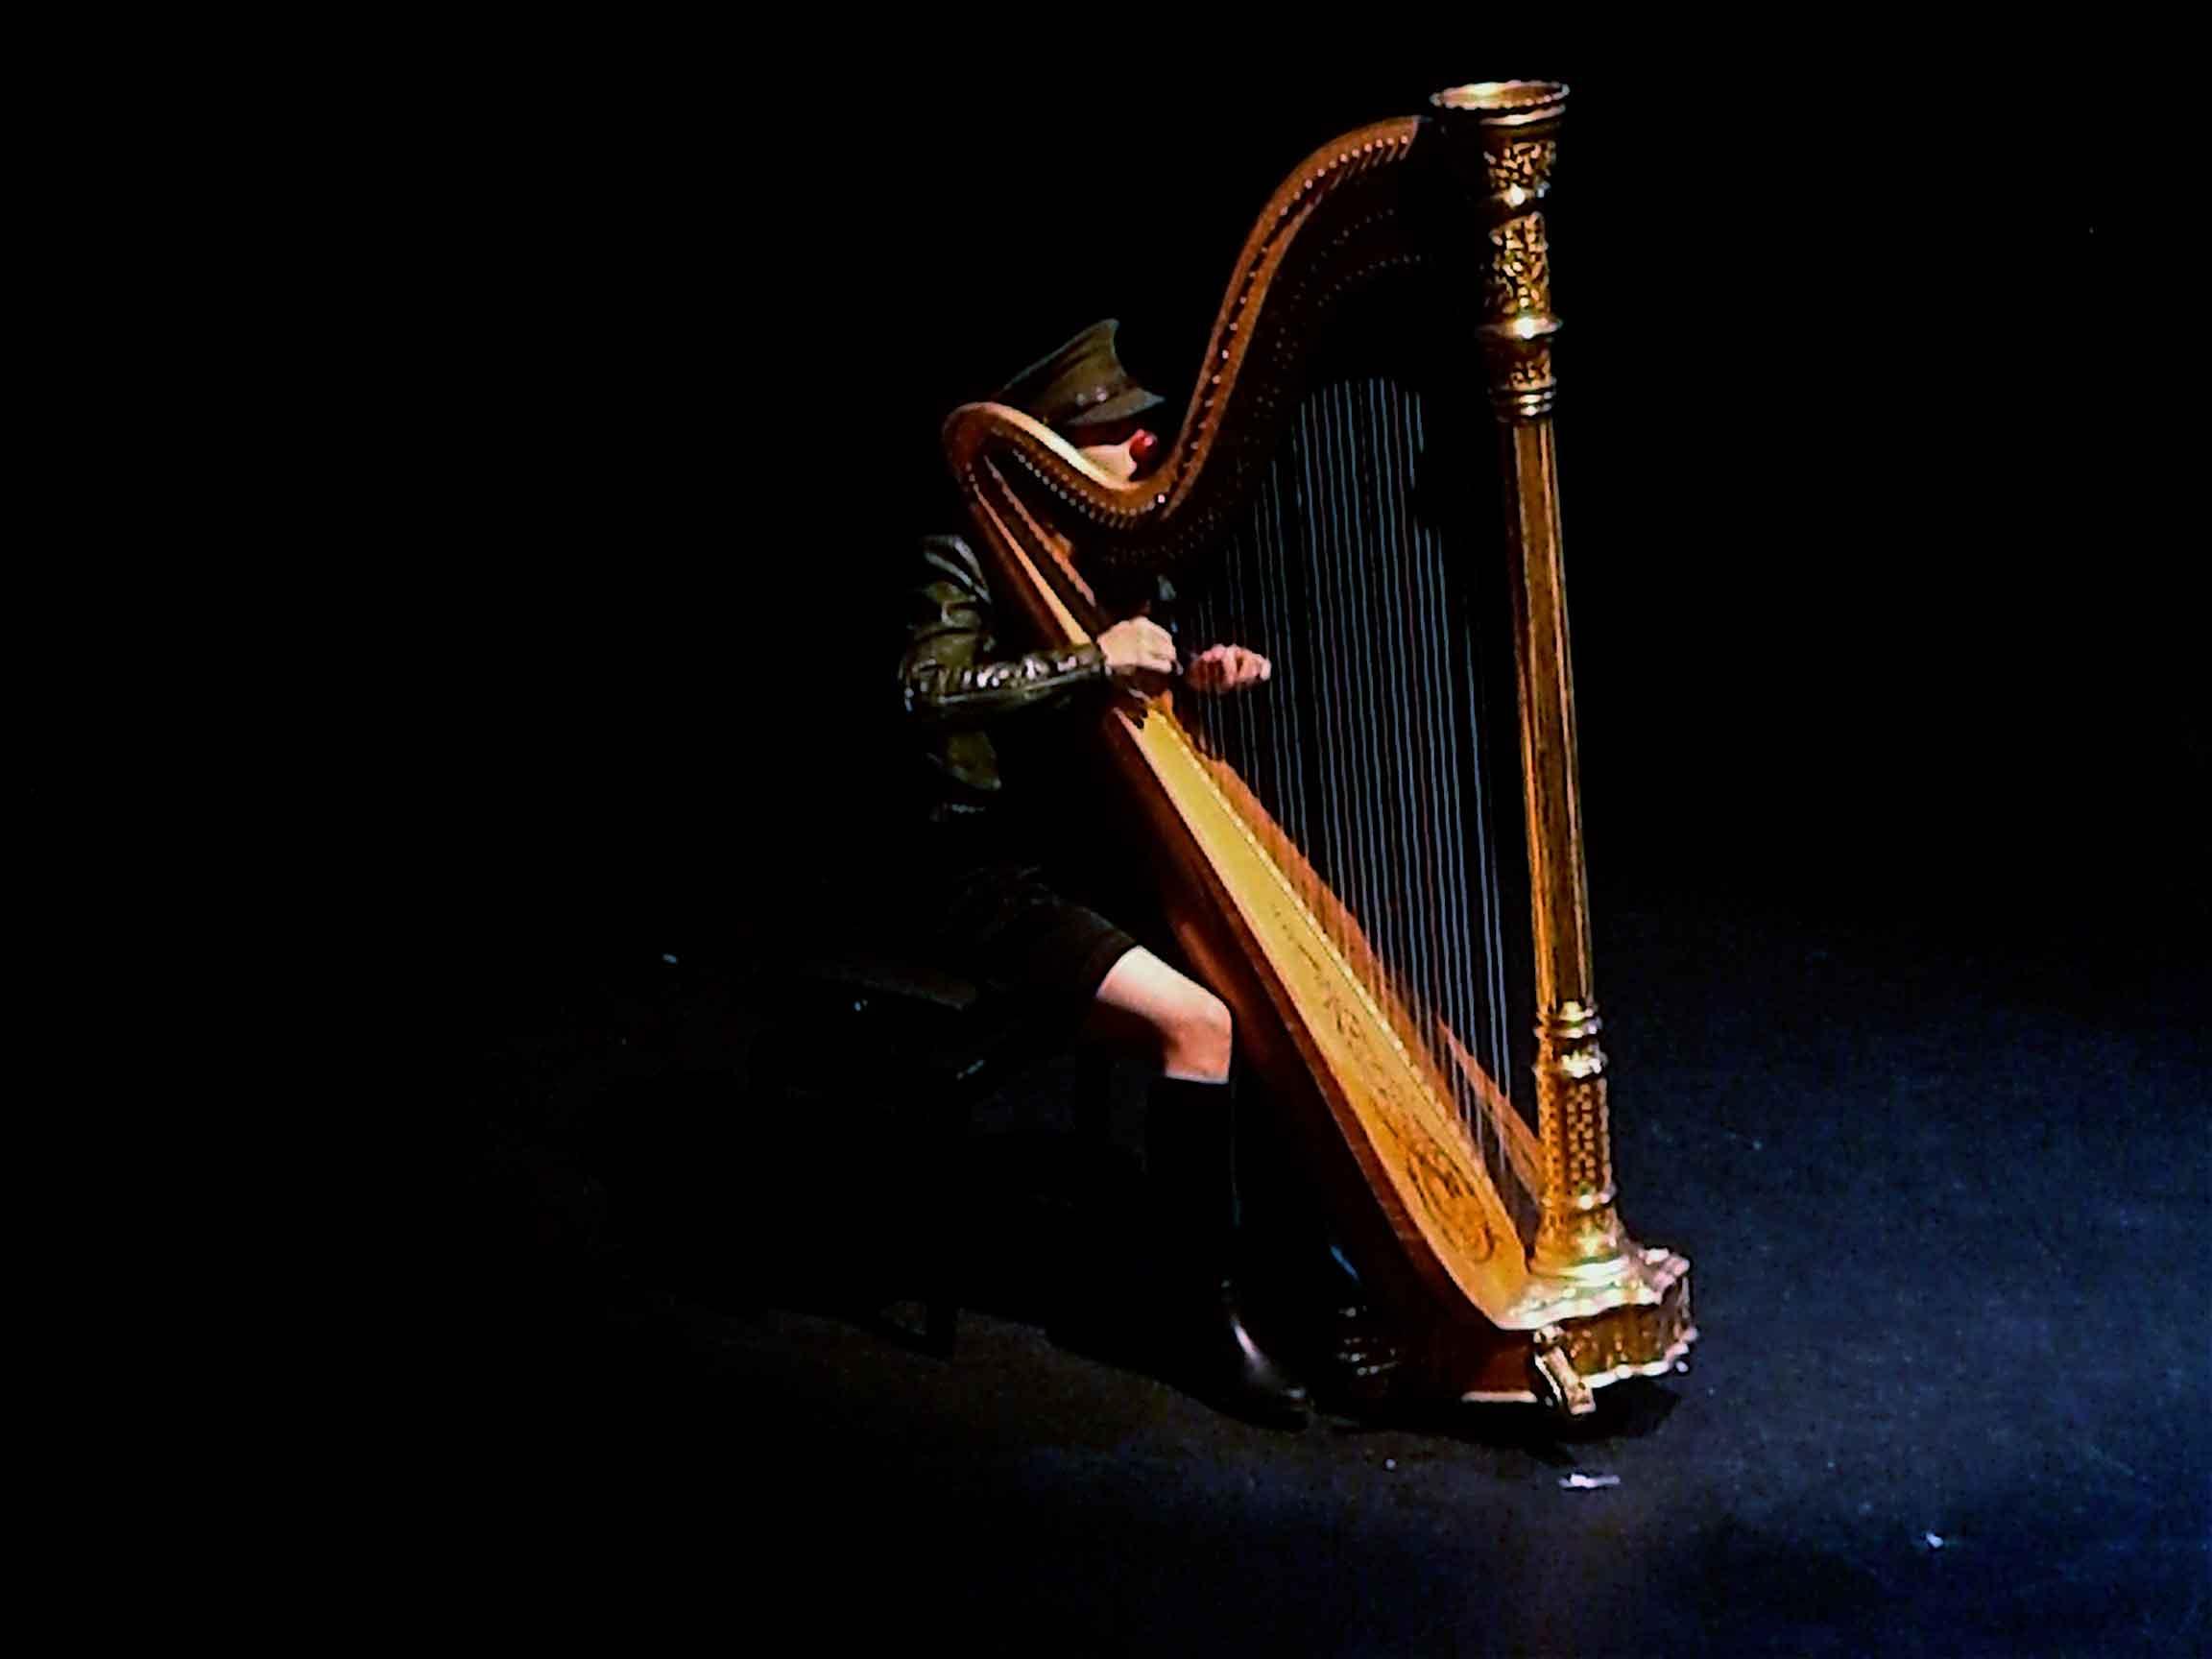 Best 49 Harp Wallpaper on HipWallpaper Sharp Wallpaper Harp 2304x1728